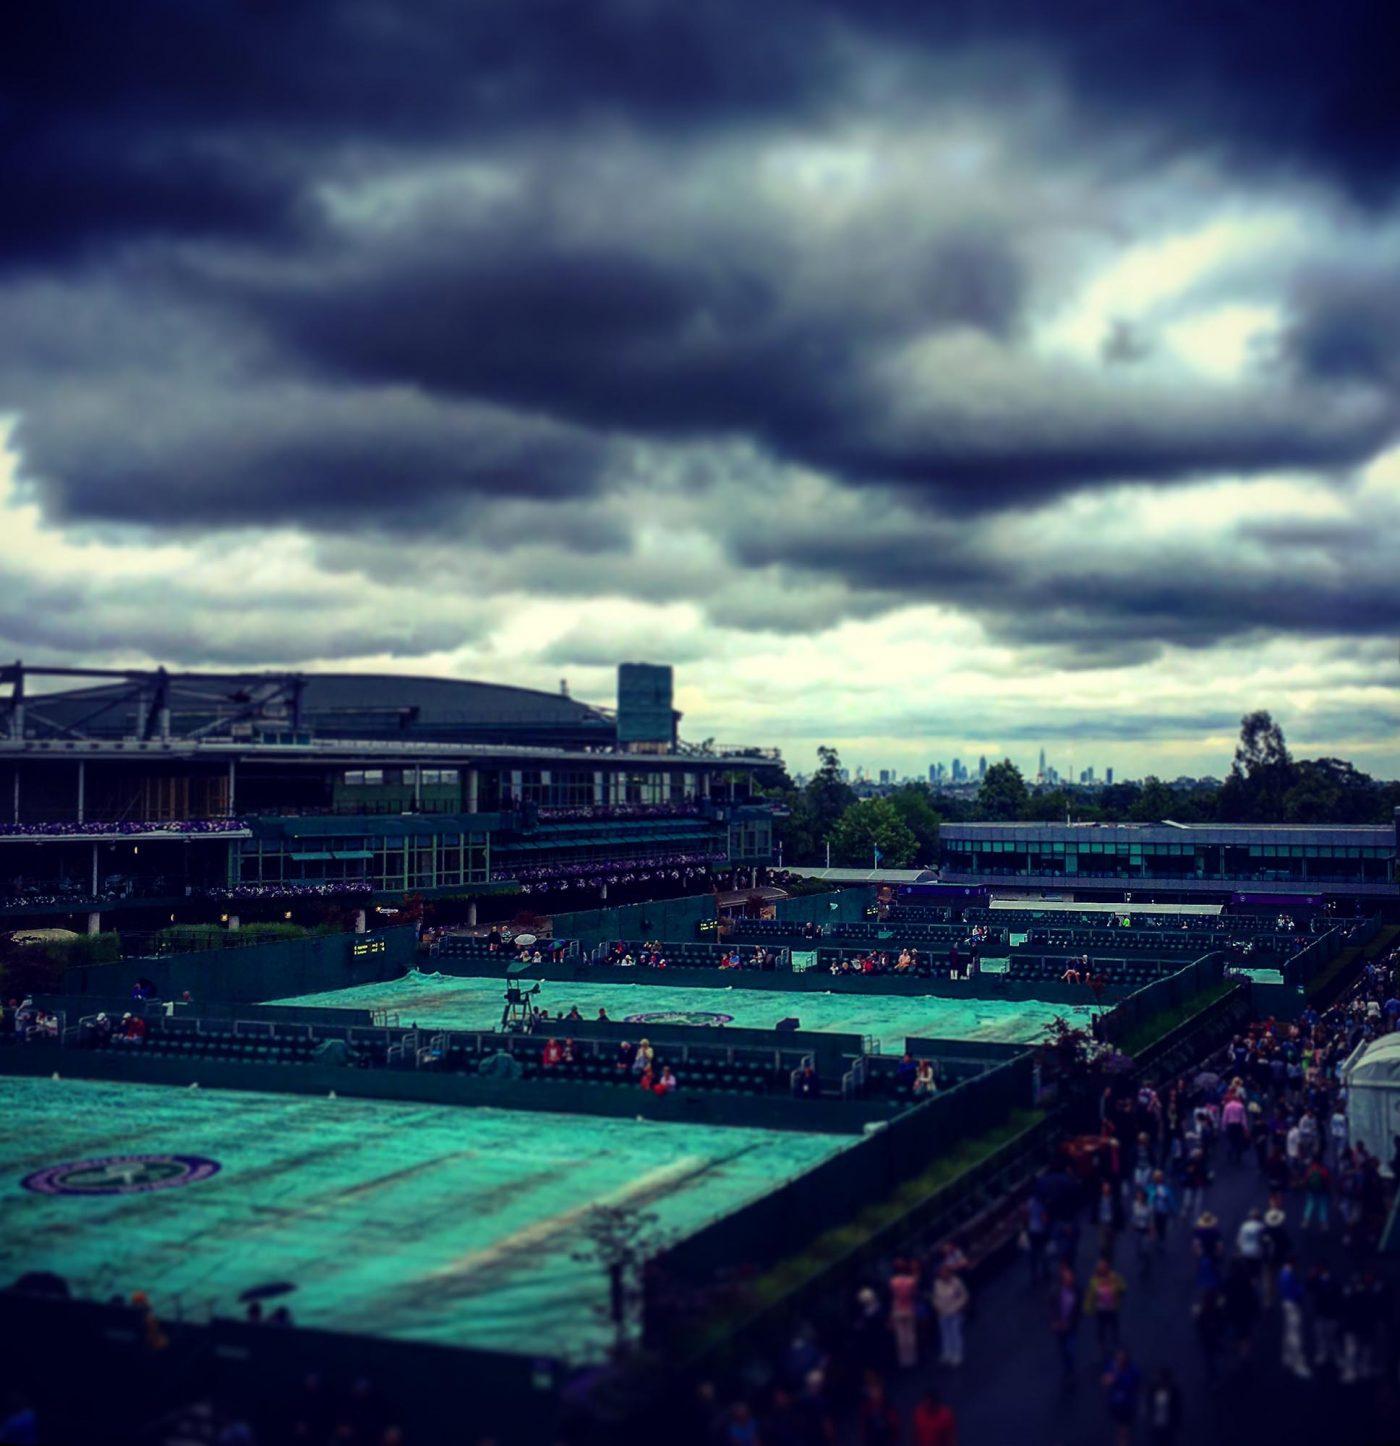 Rain covers Wimbledon Tennis